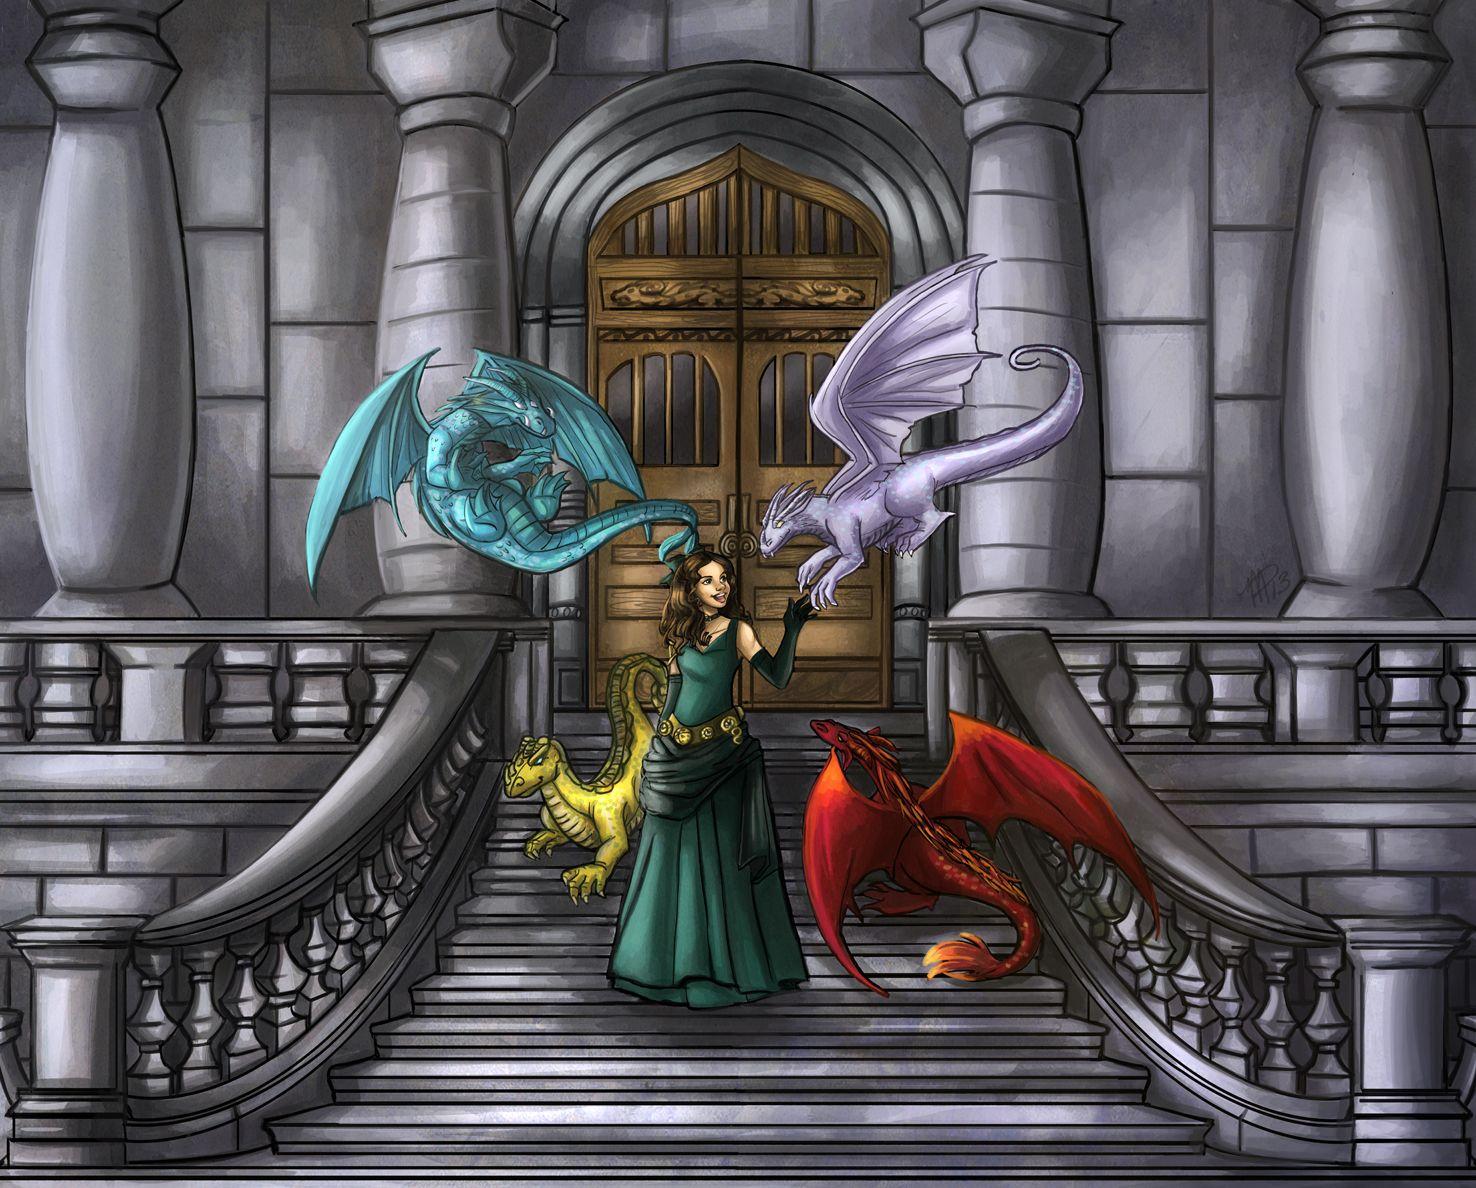 Dragon Sanctuary by mallettepagan0.deviantart.com on @DeviantArt